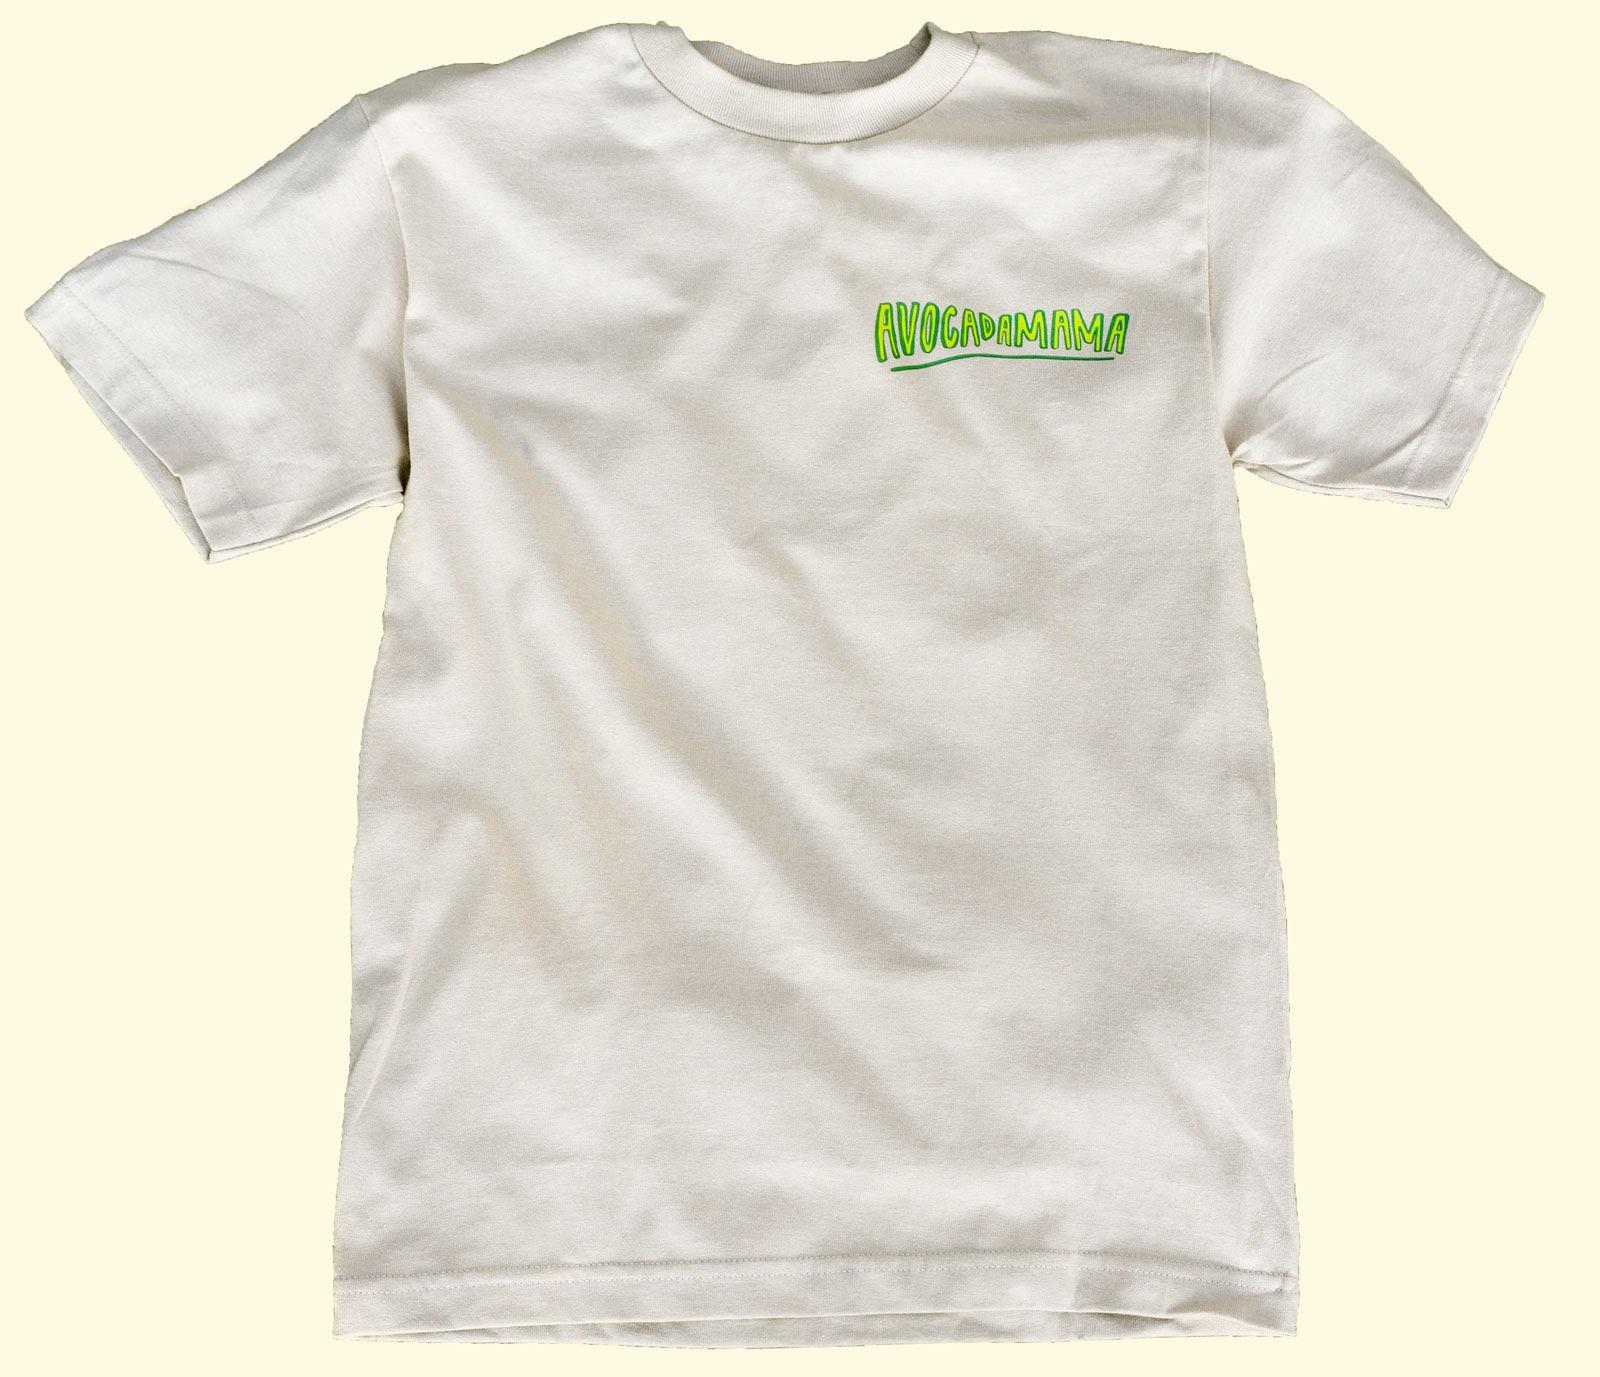 Avocadamama Shirt Front